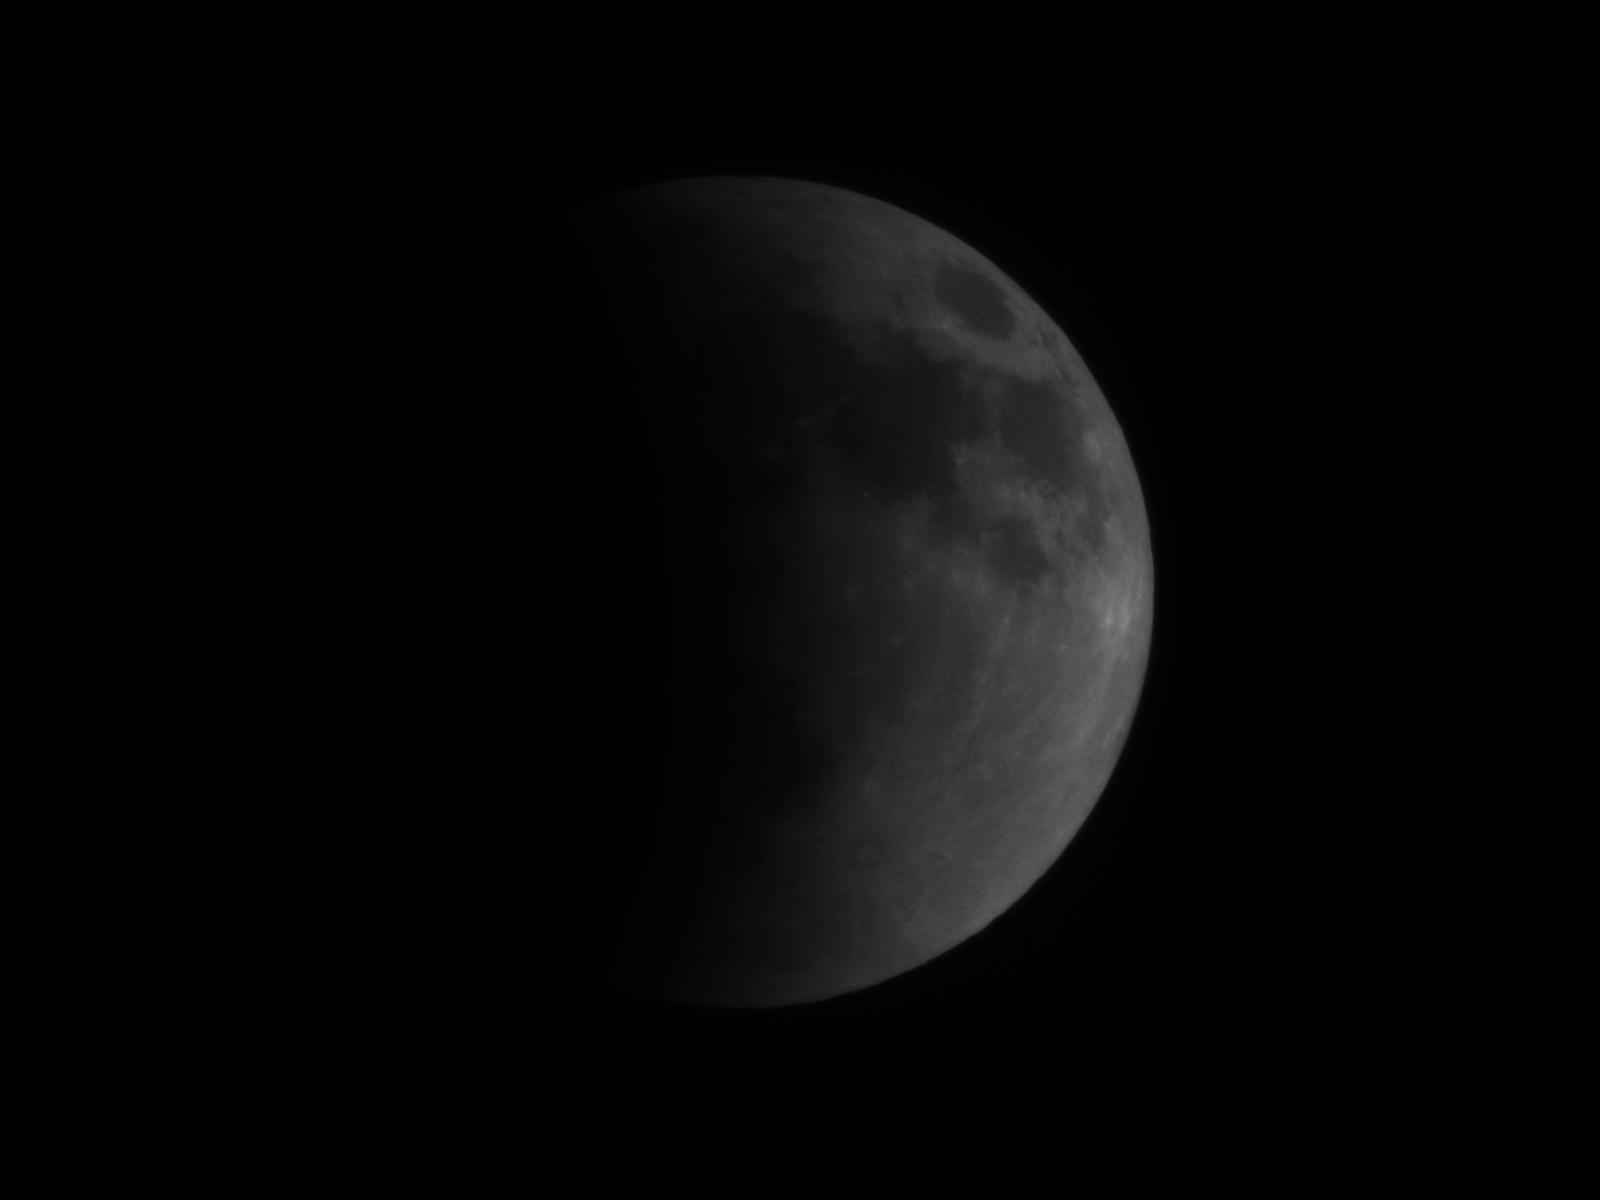 Total lunar eclipse. April 15, 2014 | SPONLI - News